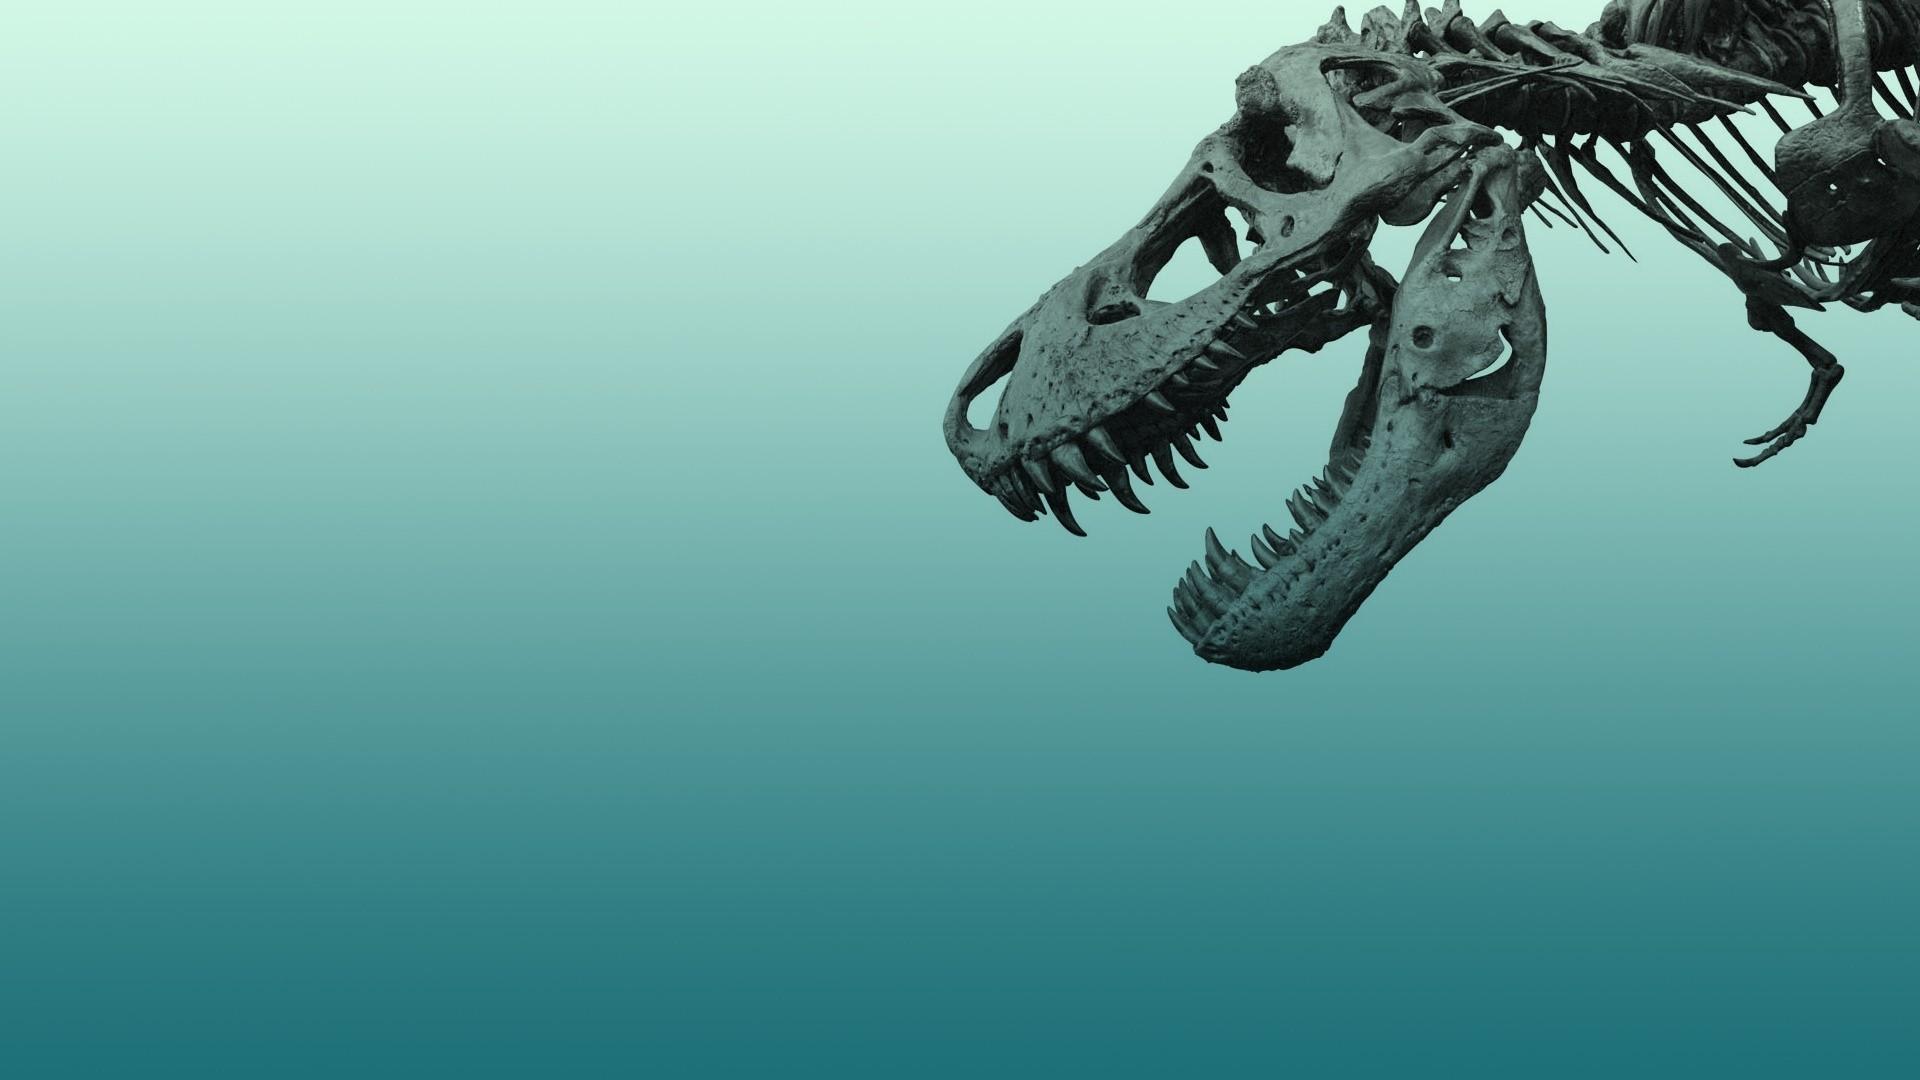 Minimalist Dinosaur Wallpaper Pic